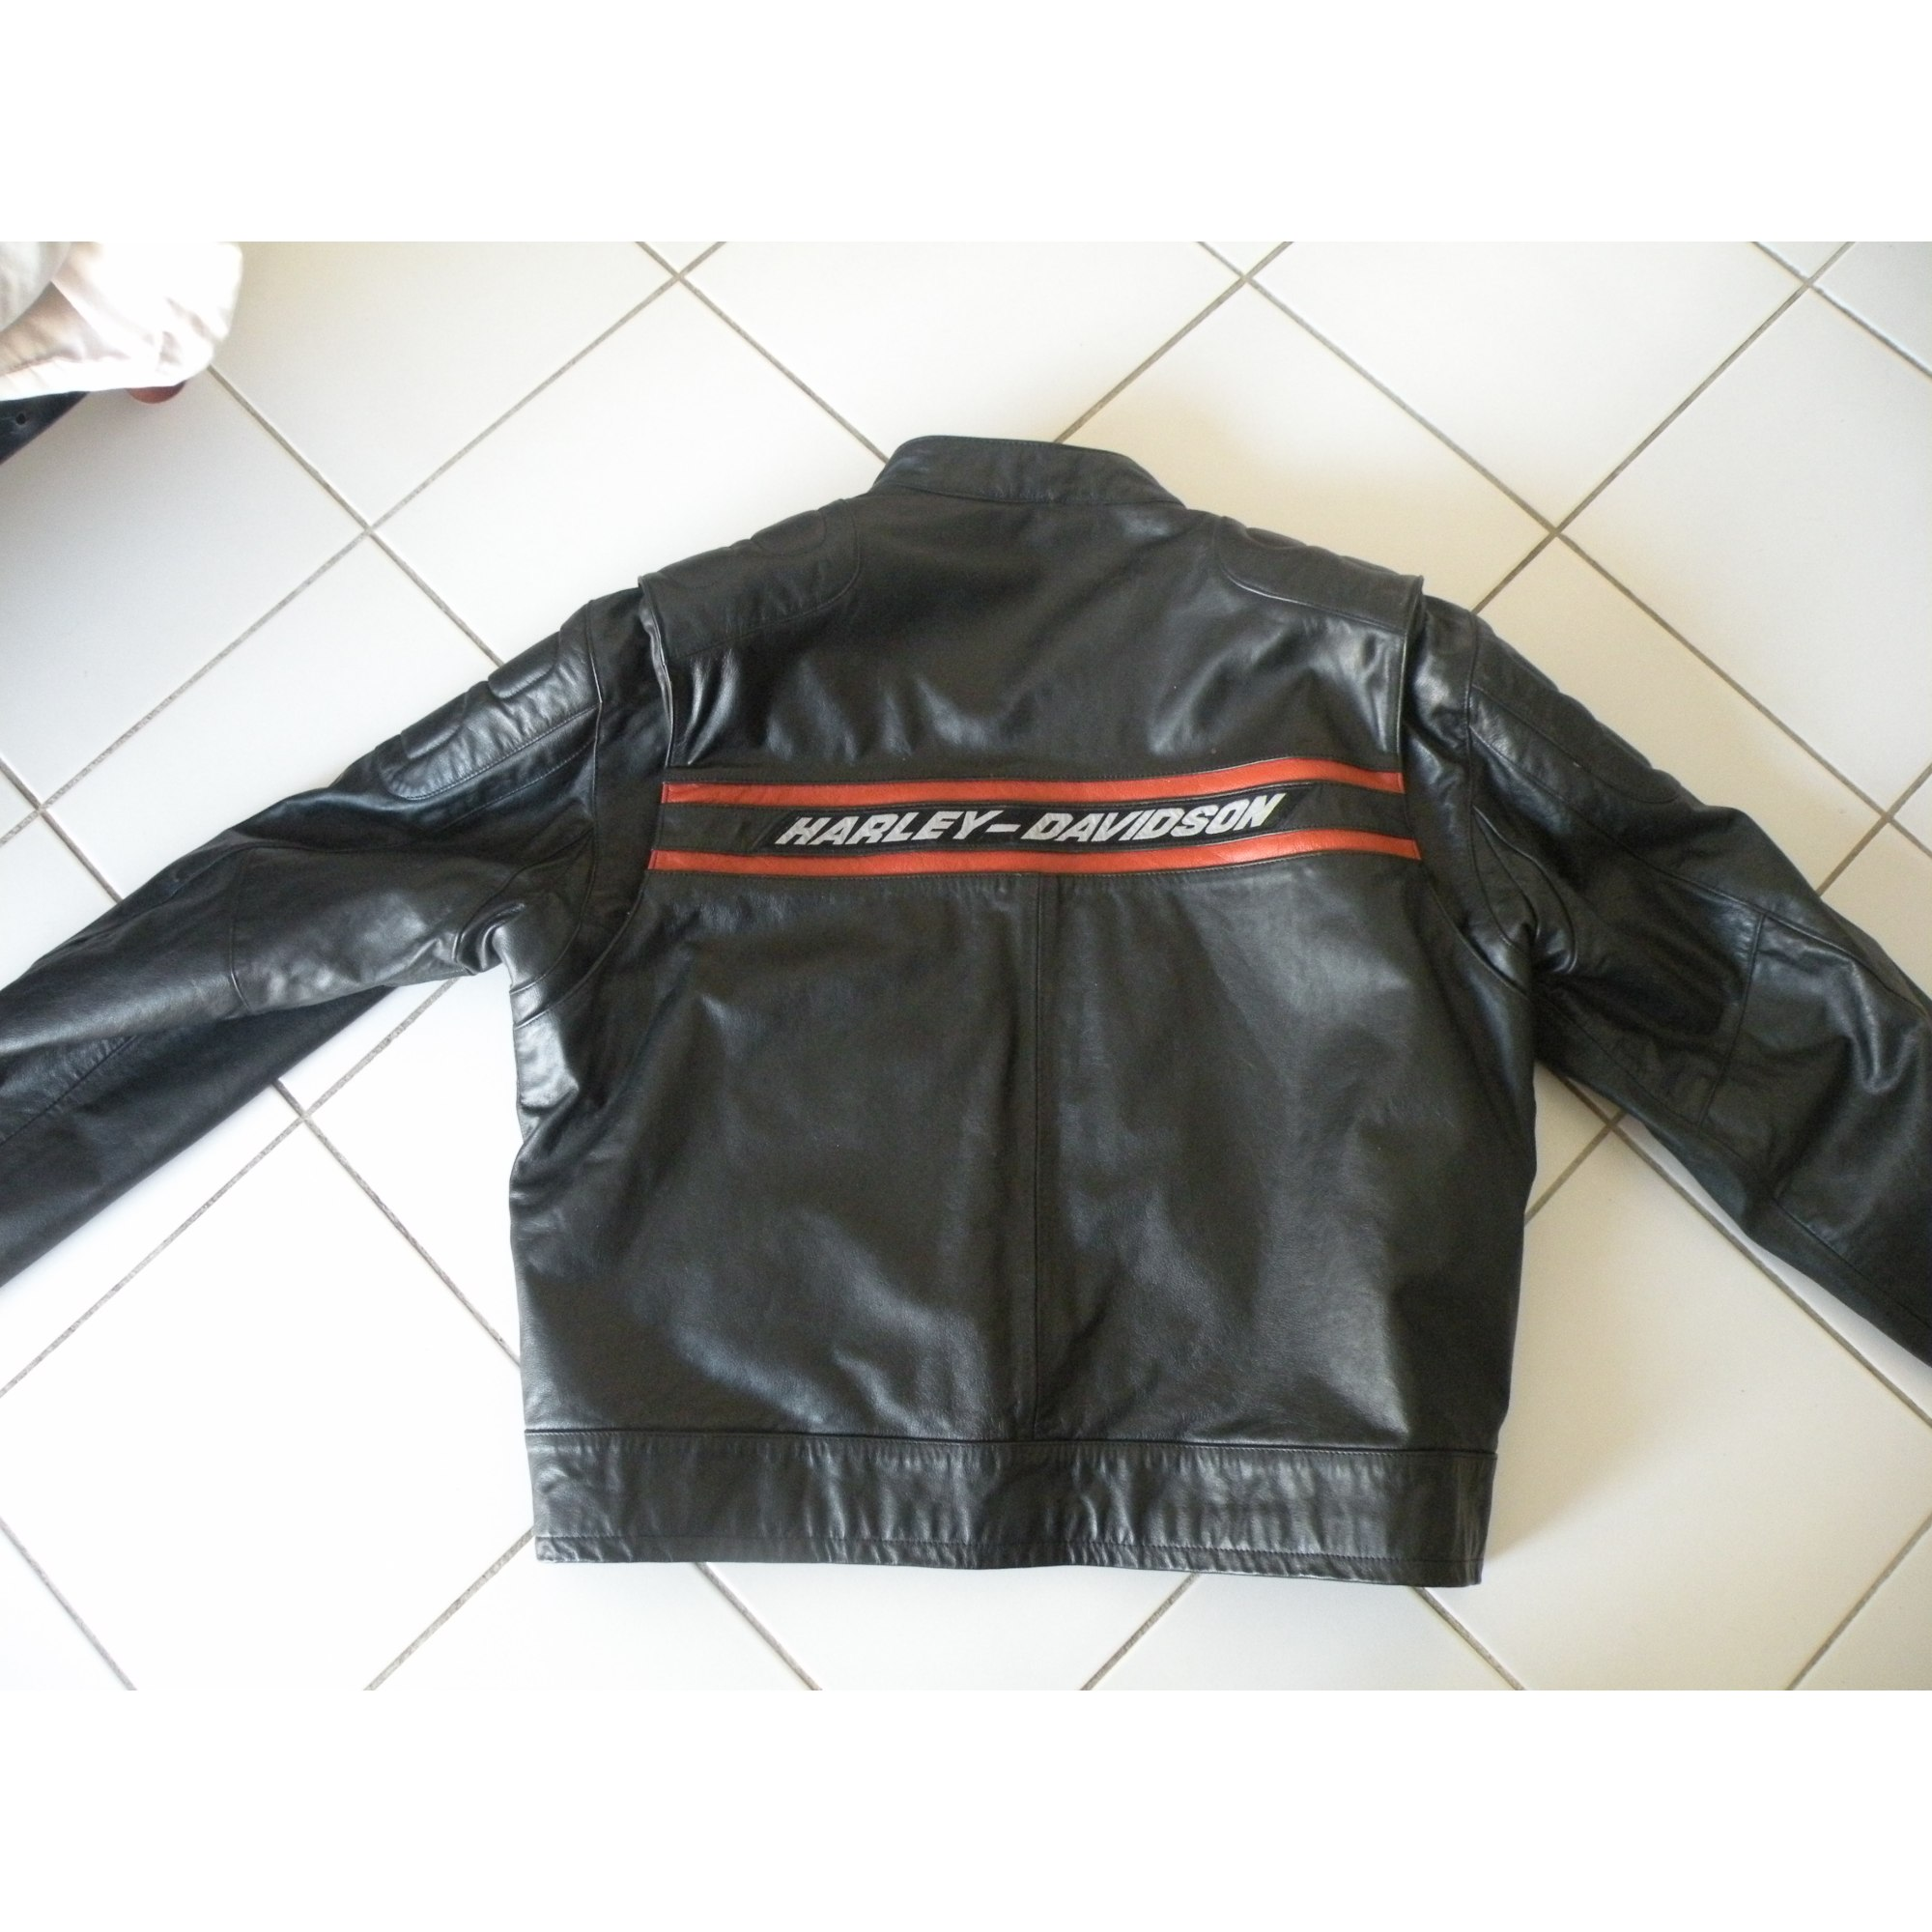 Noir Davidson Blouson 300740 xxxl 64 Cuir Harley En vwtFY